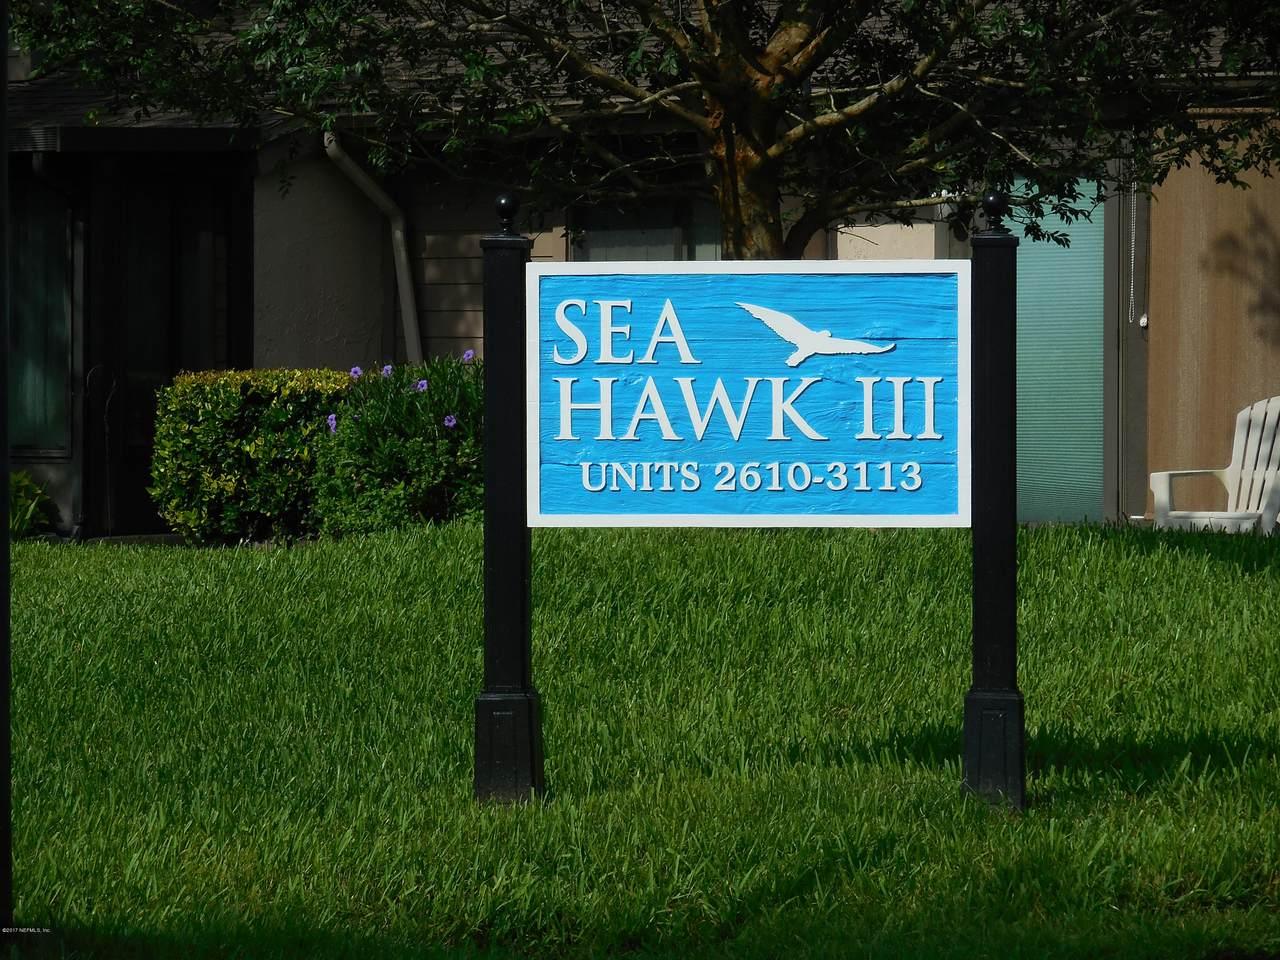 3011 Seahawk Dr - Photo 1